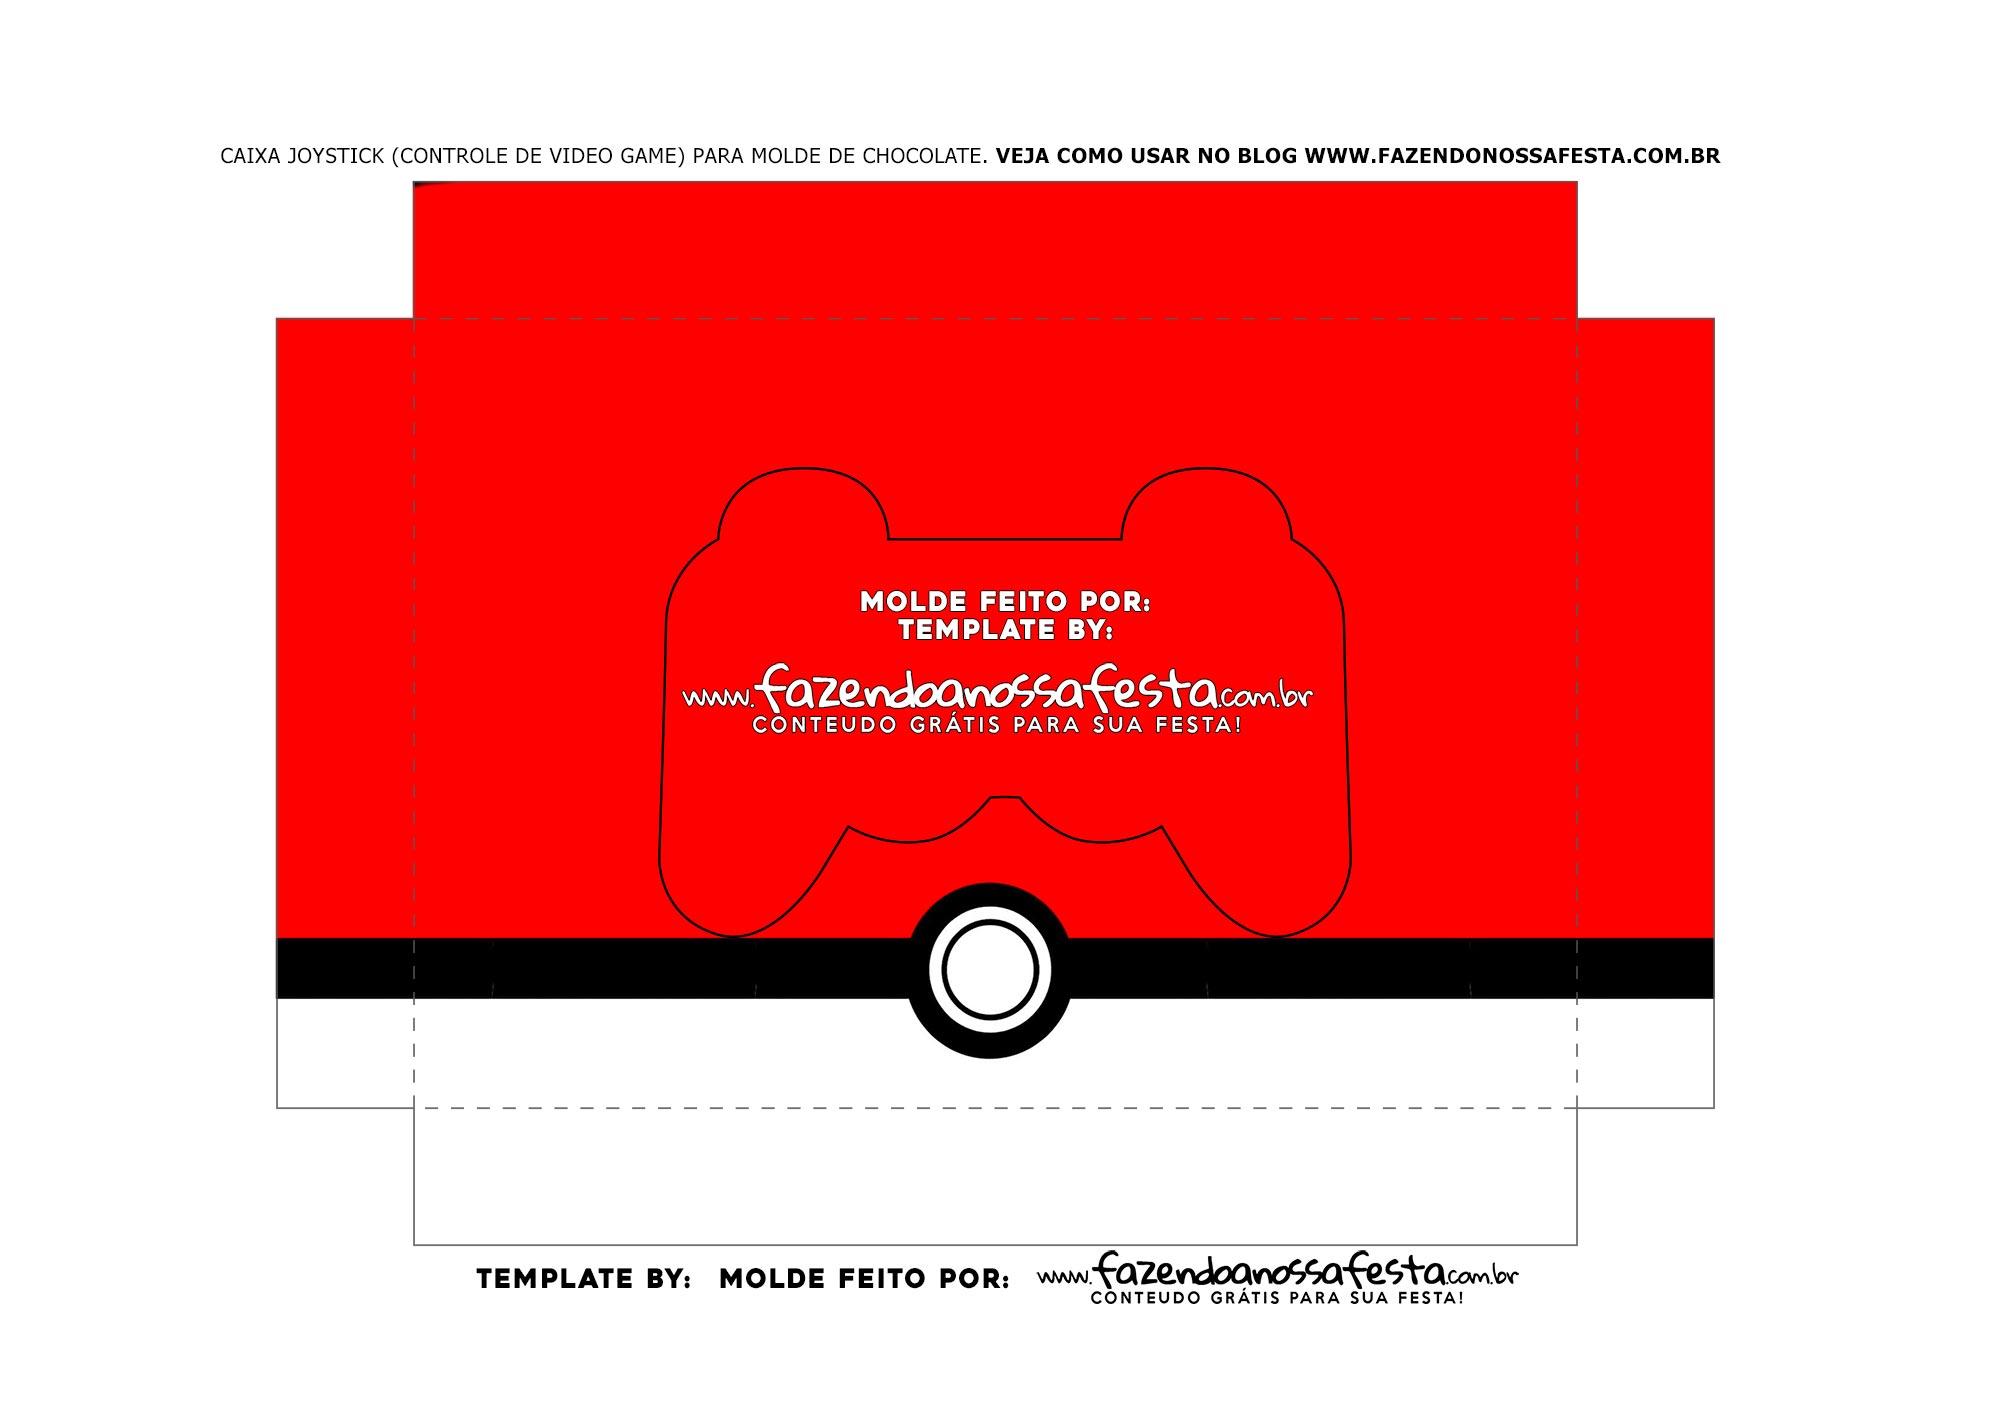 Berco Caixa Controle de Chocolate Pequeno Pokemon